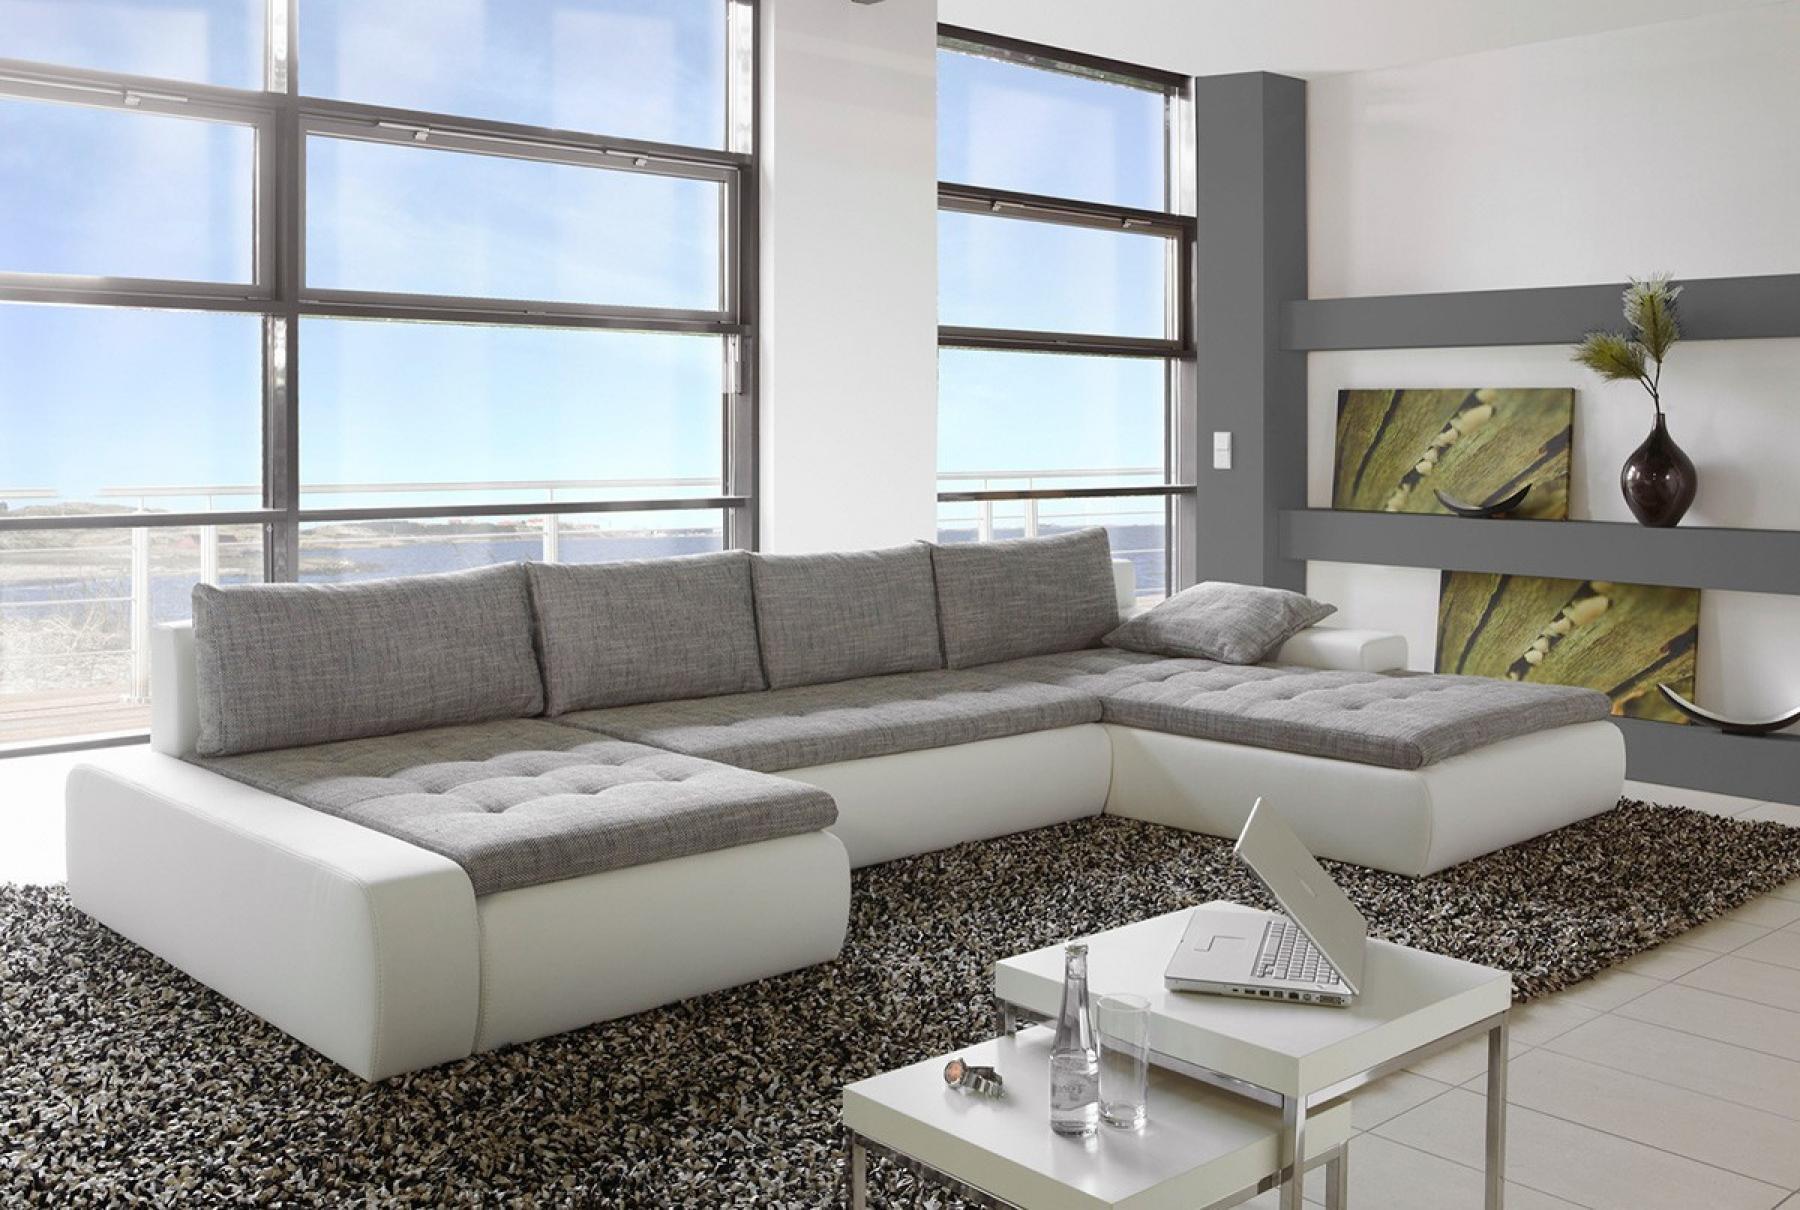 photos canap d 39 angle gris. Black Bedroom Furniture Sets. Home Design Ideas